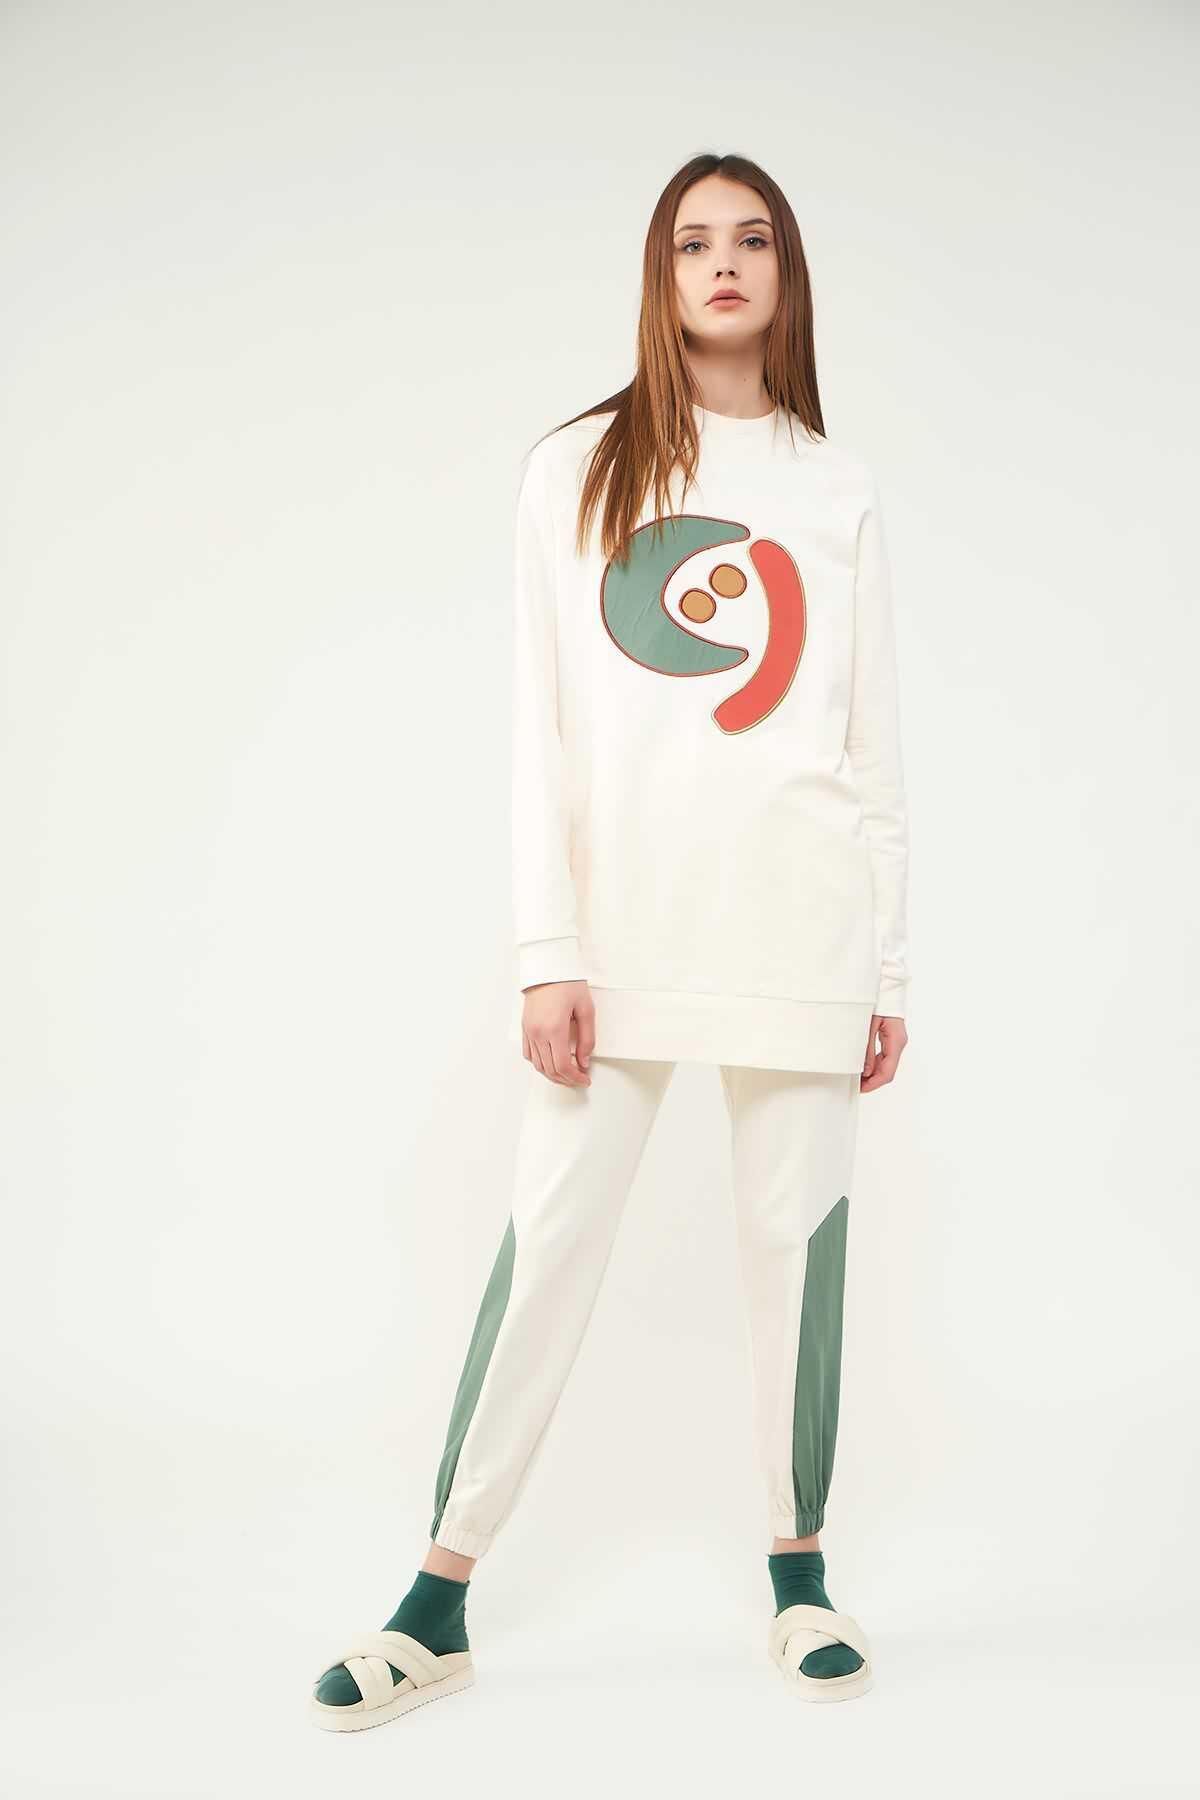 Mevra - Nakışlı Sweatshirt N2 Yeşil